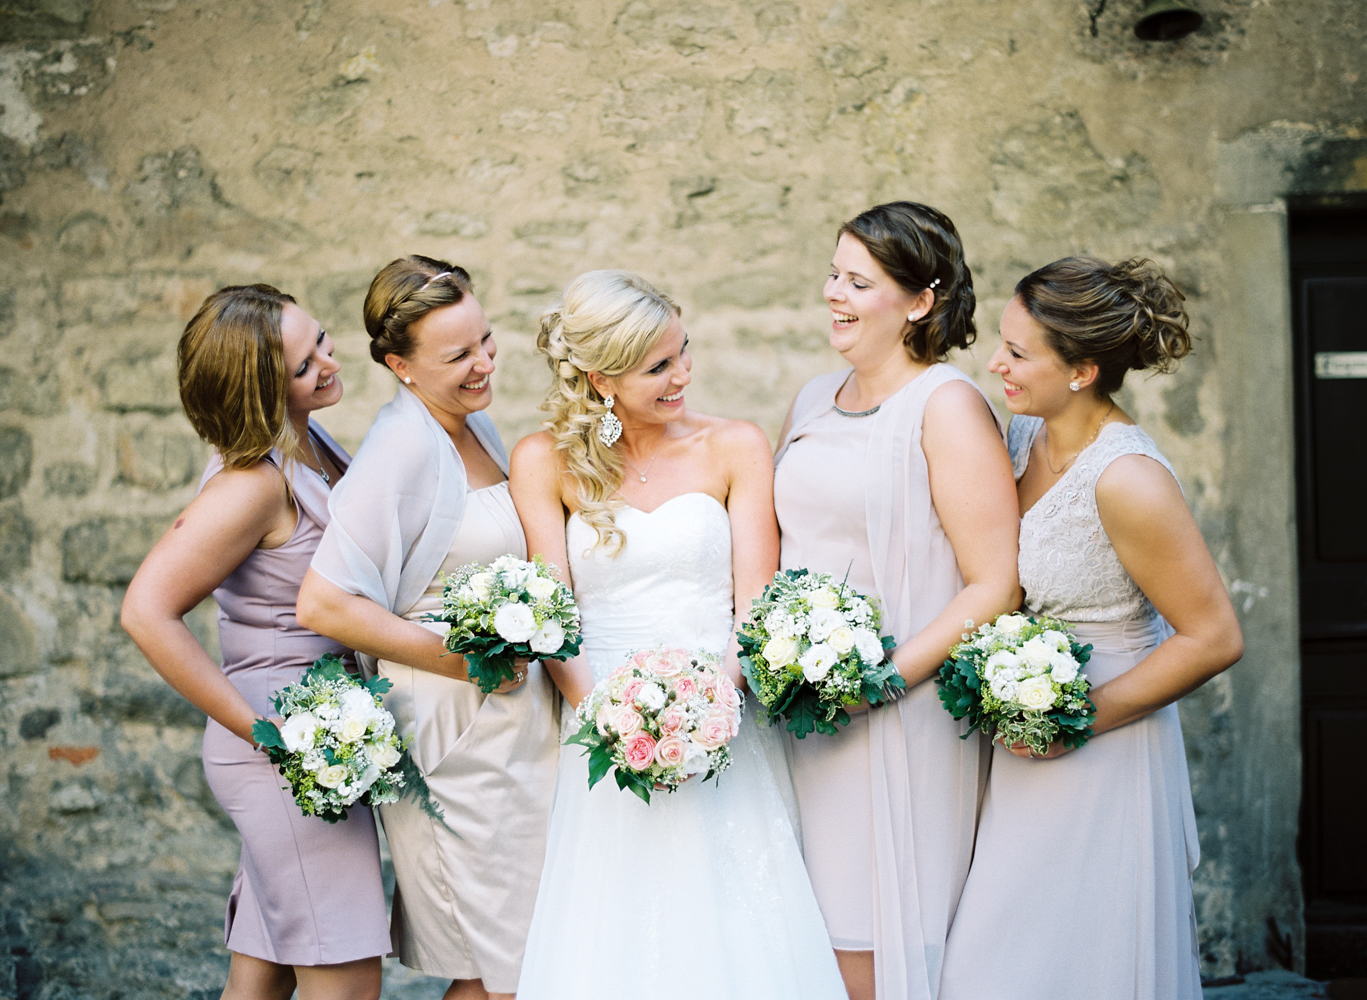 Hochzeitsfotograf_Stuttgart_Karoline_Kirchhof (9).jpg